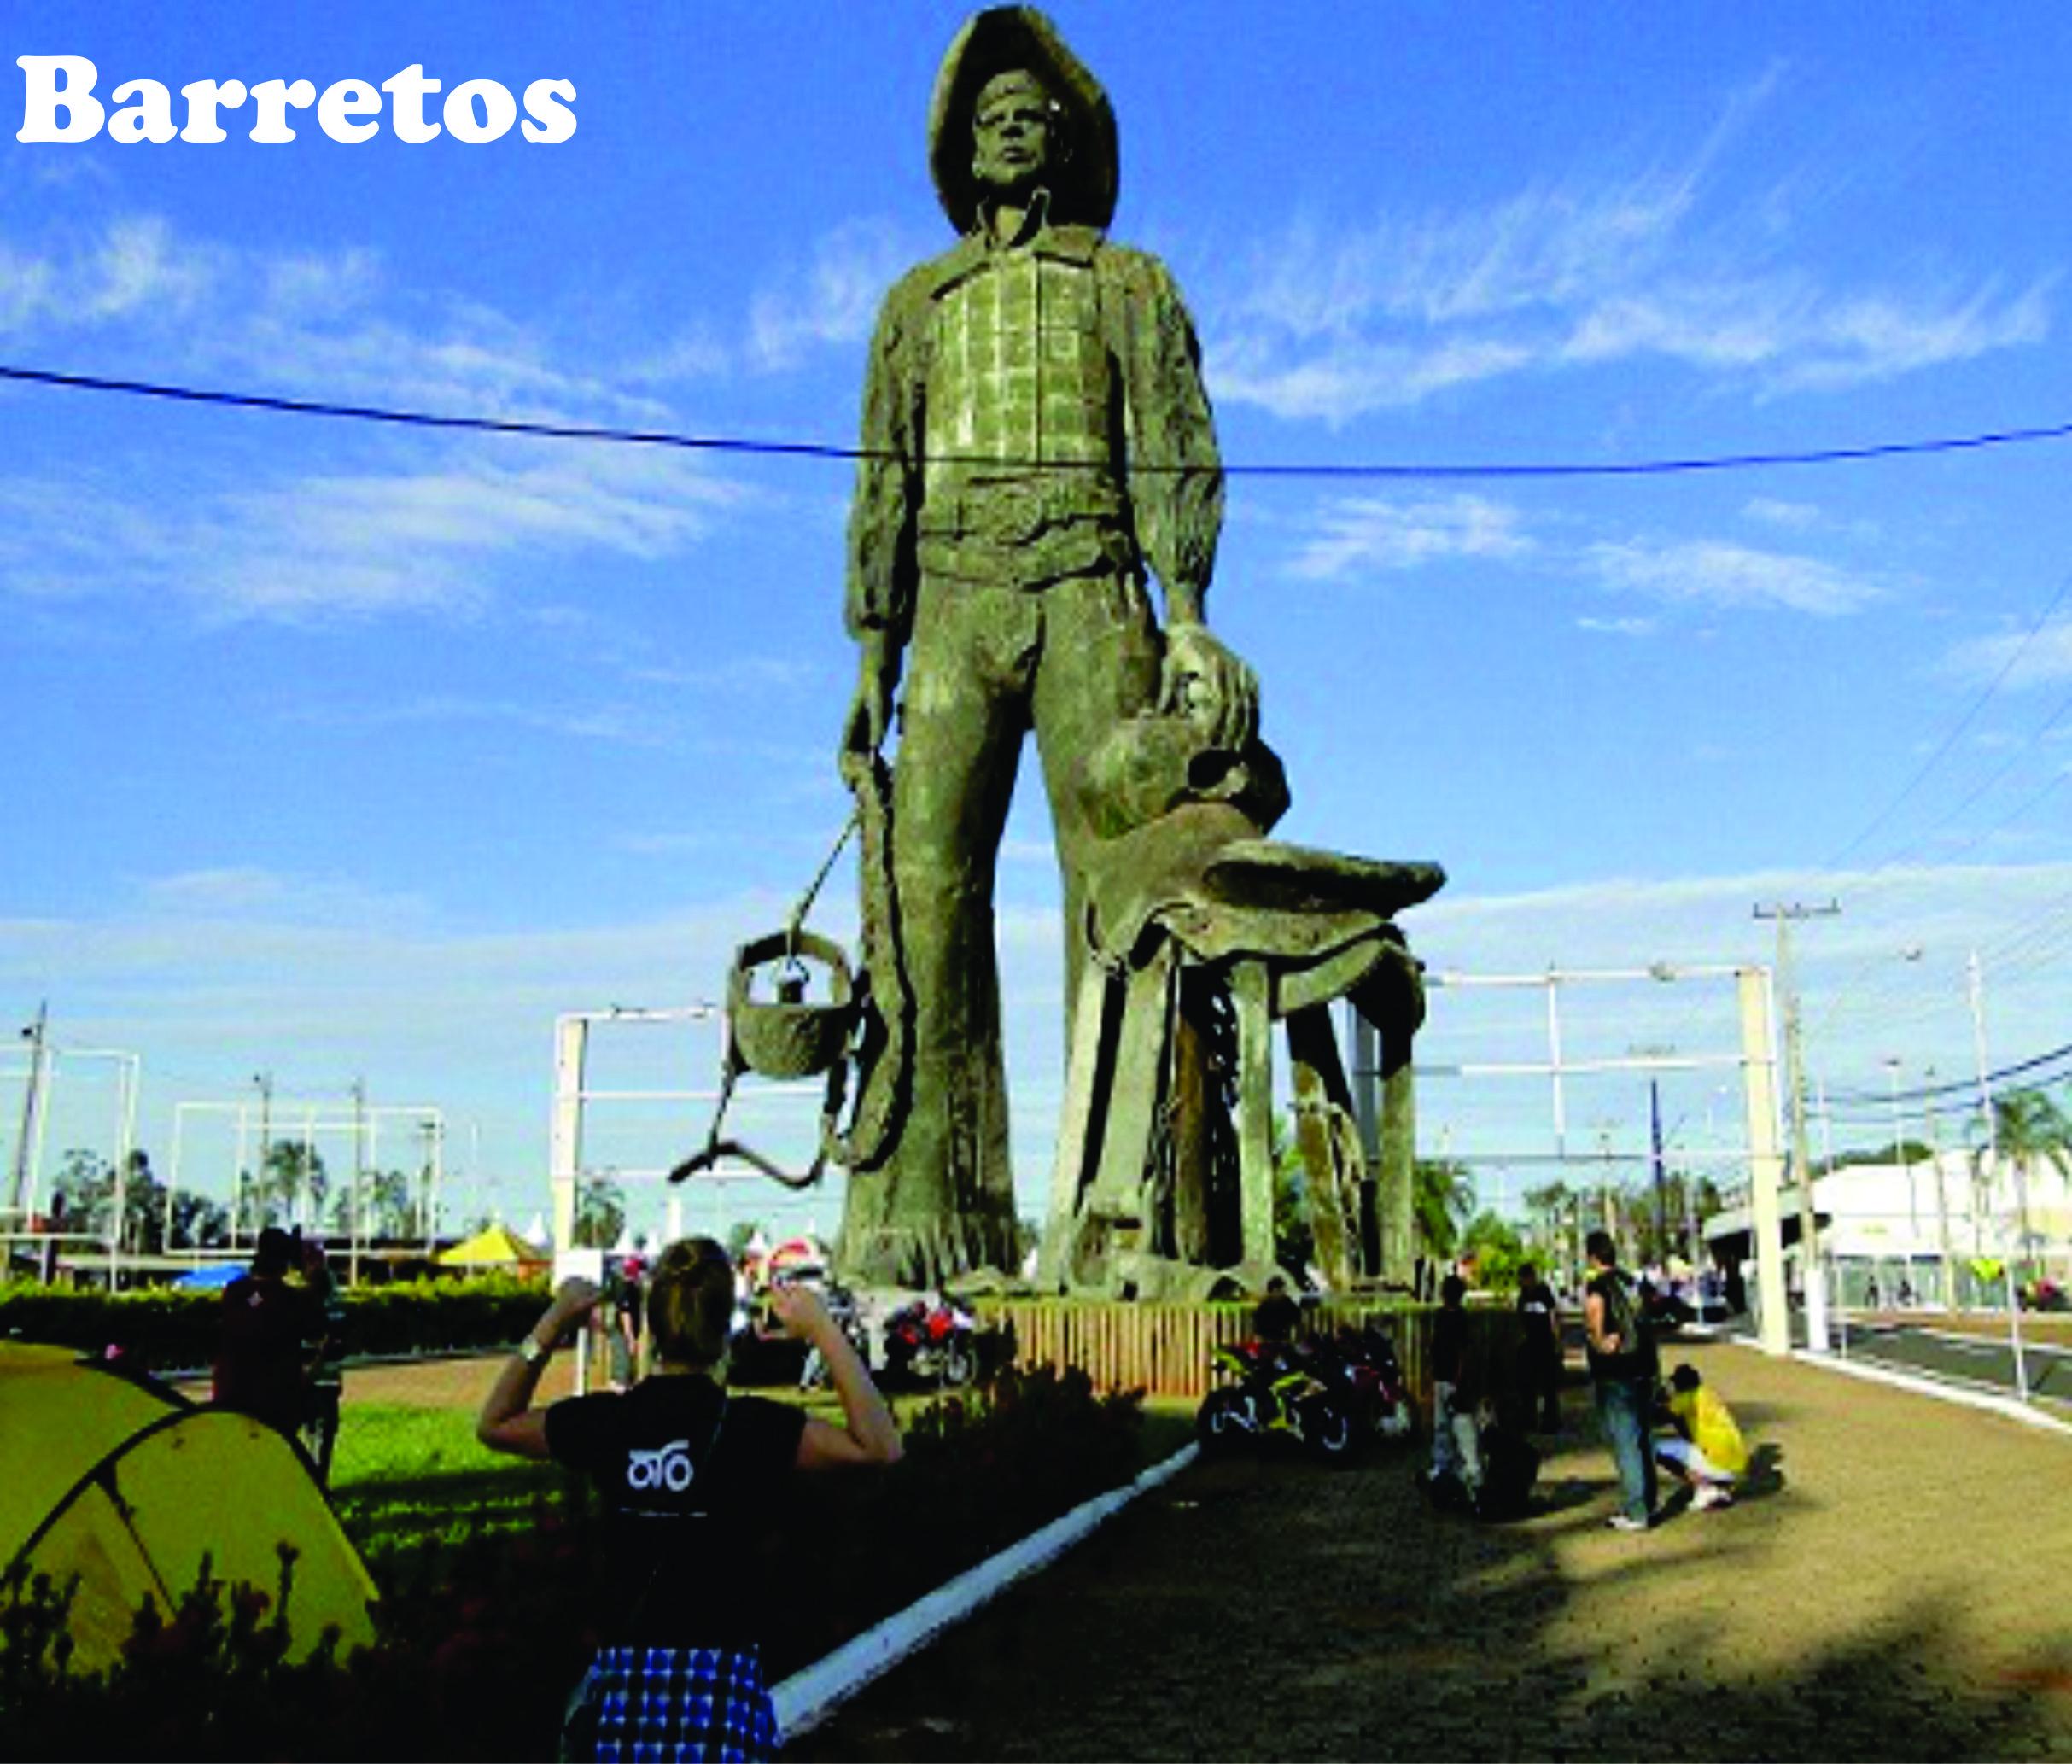 BARRETOS